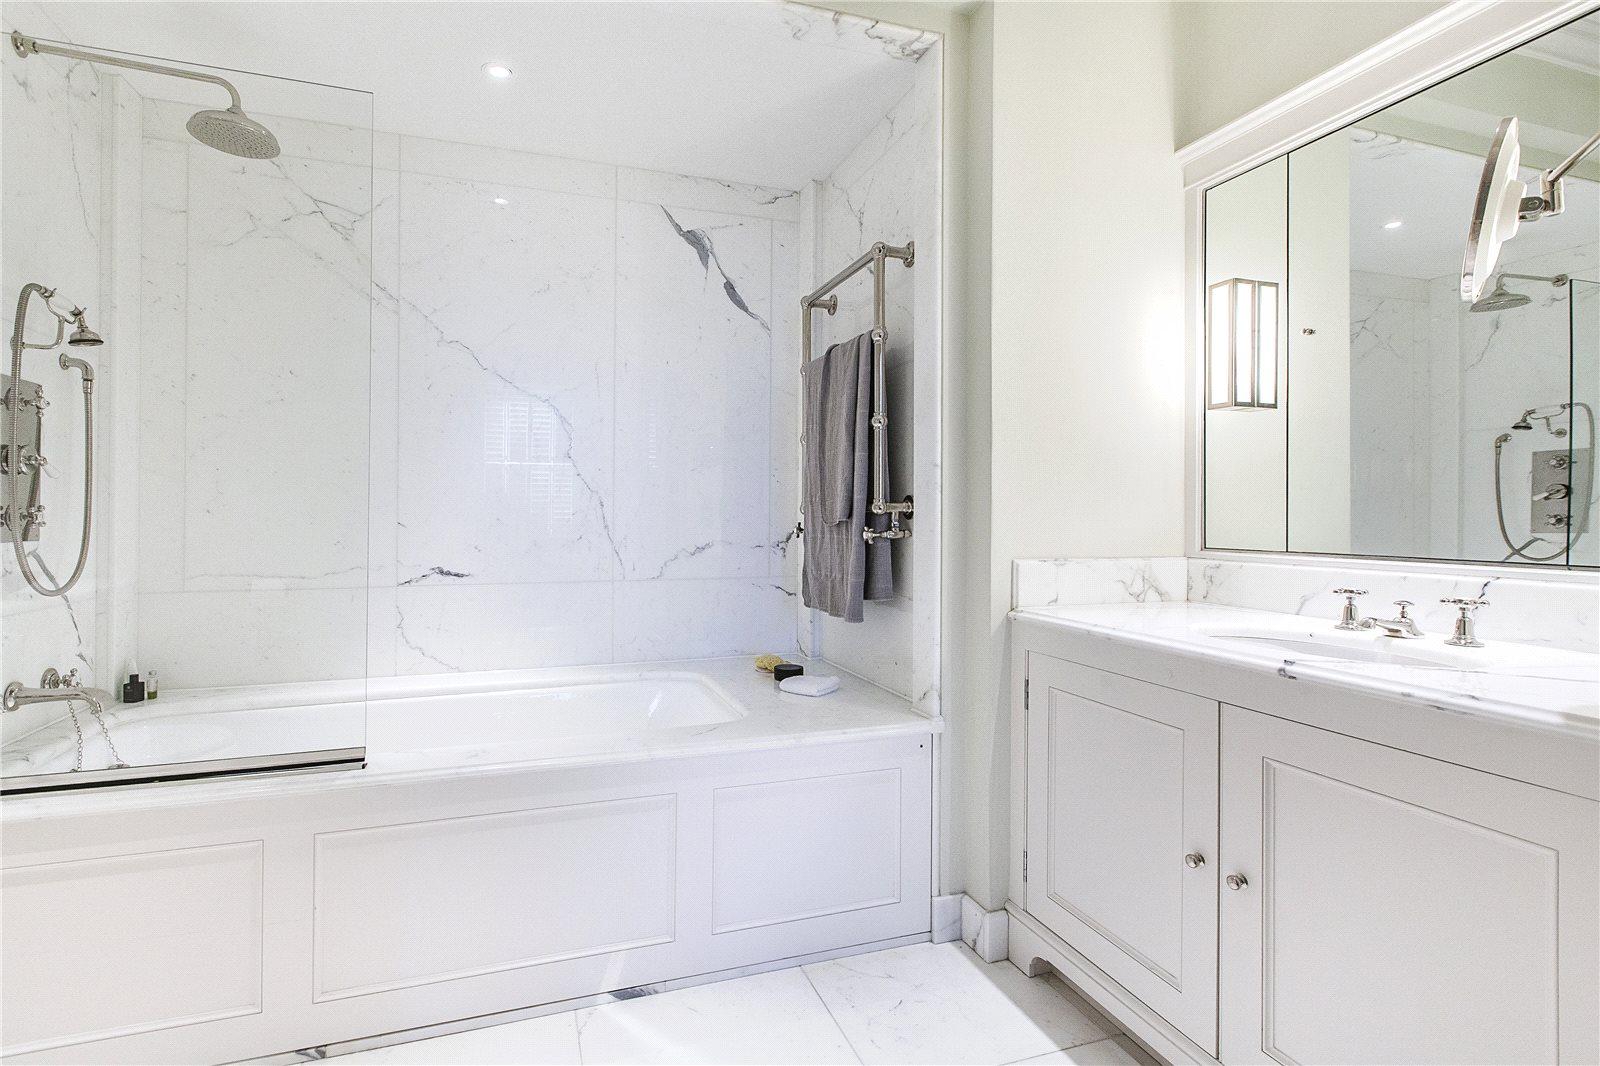 Rutland Gate,Bathroom